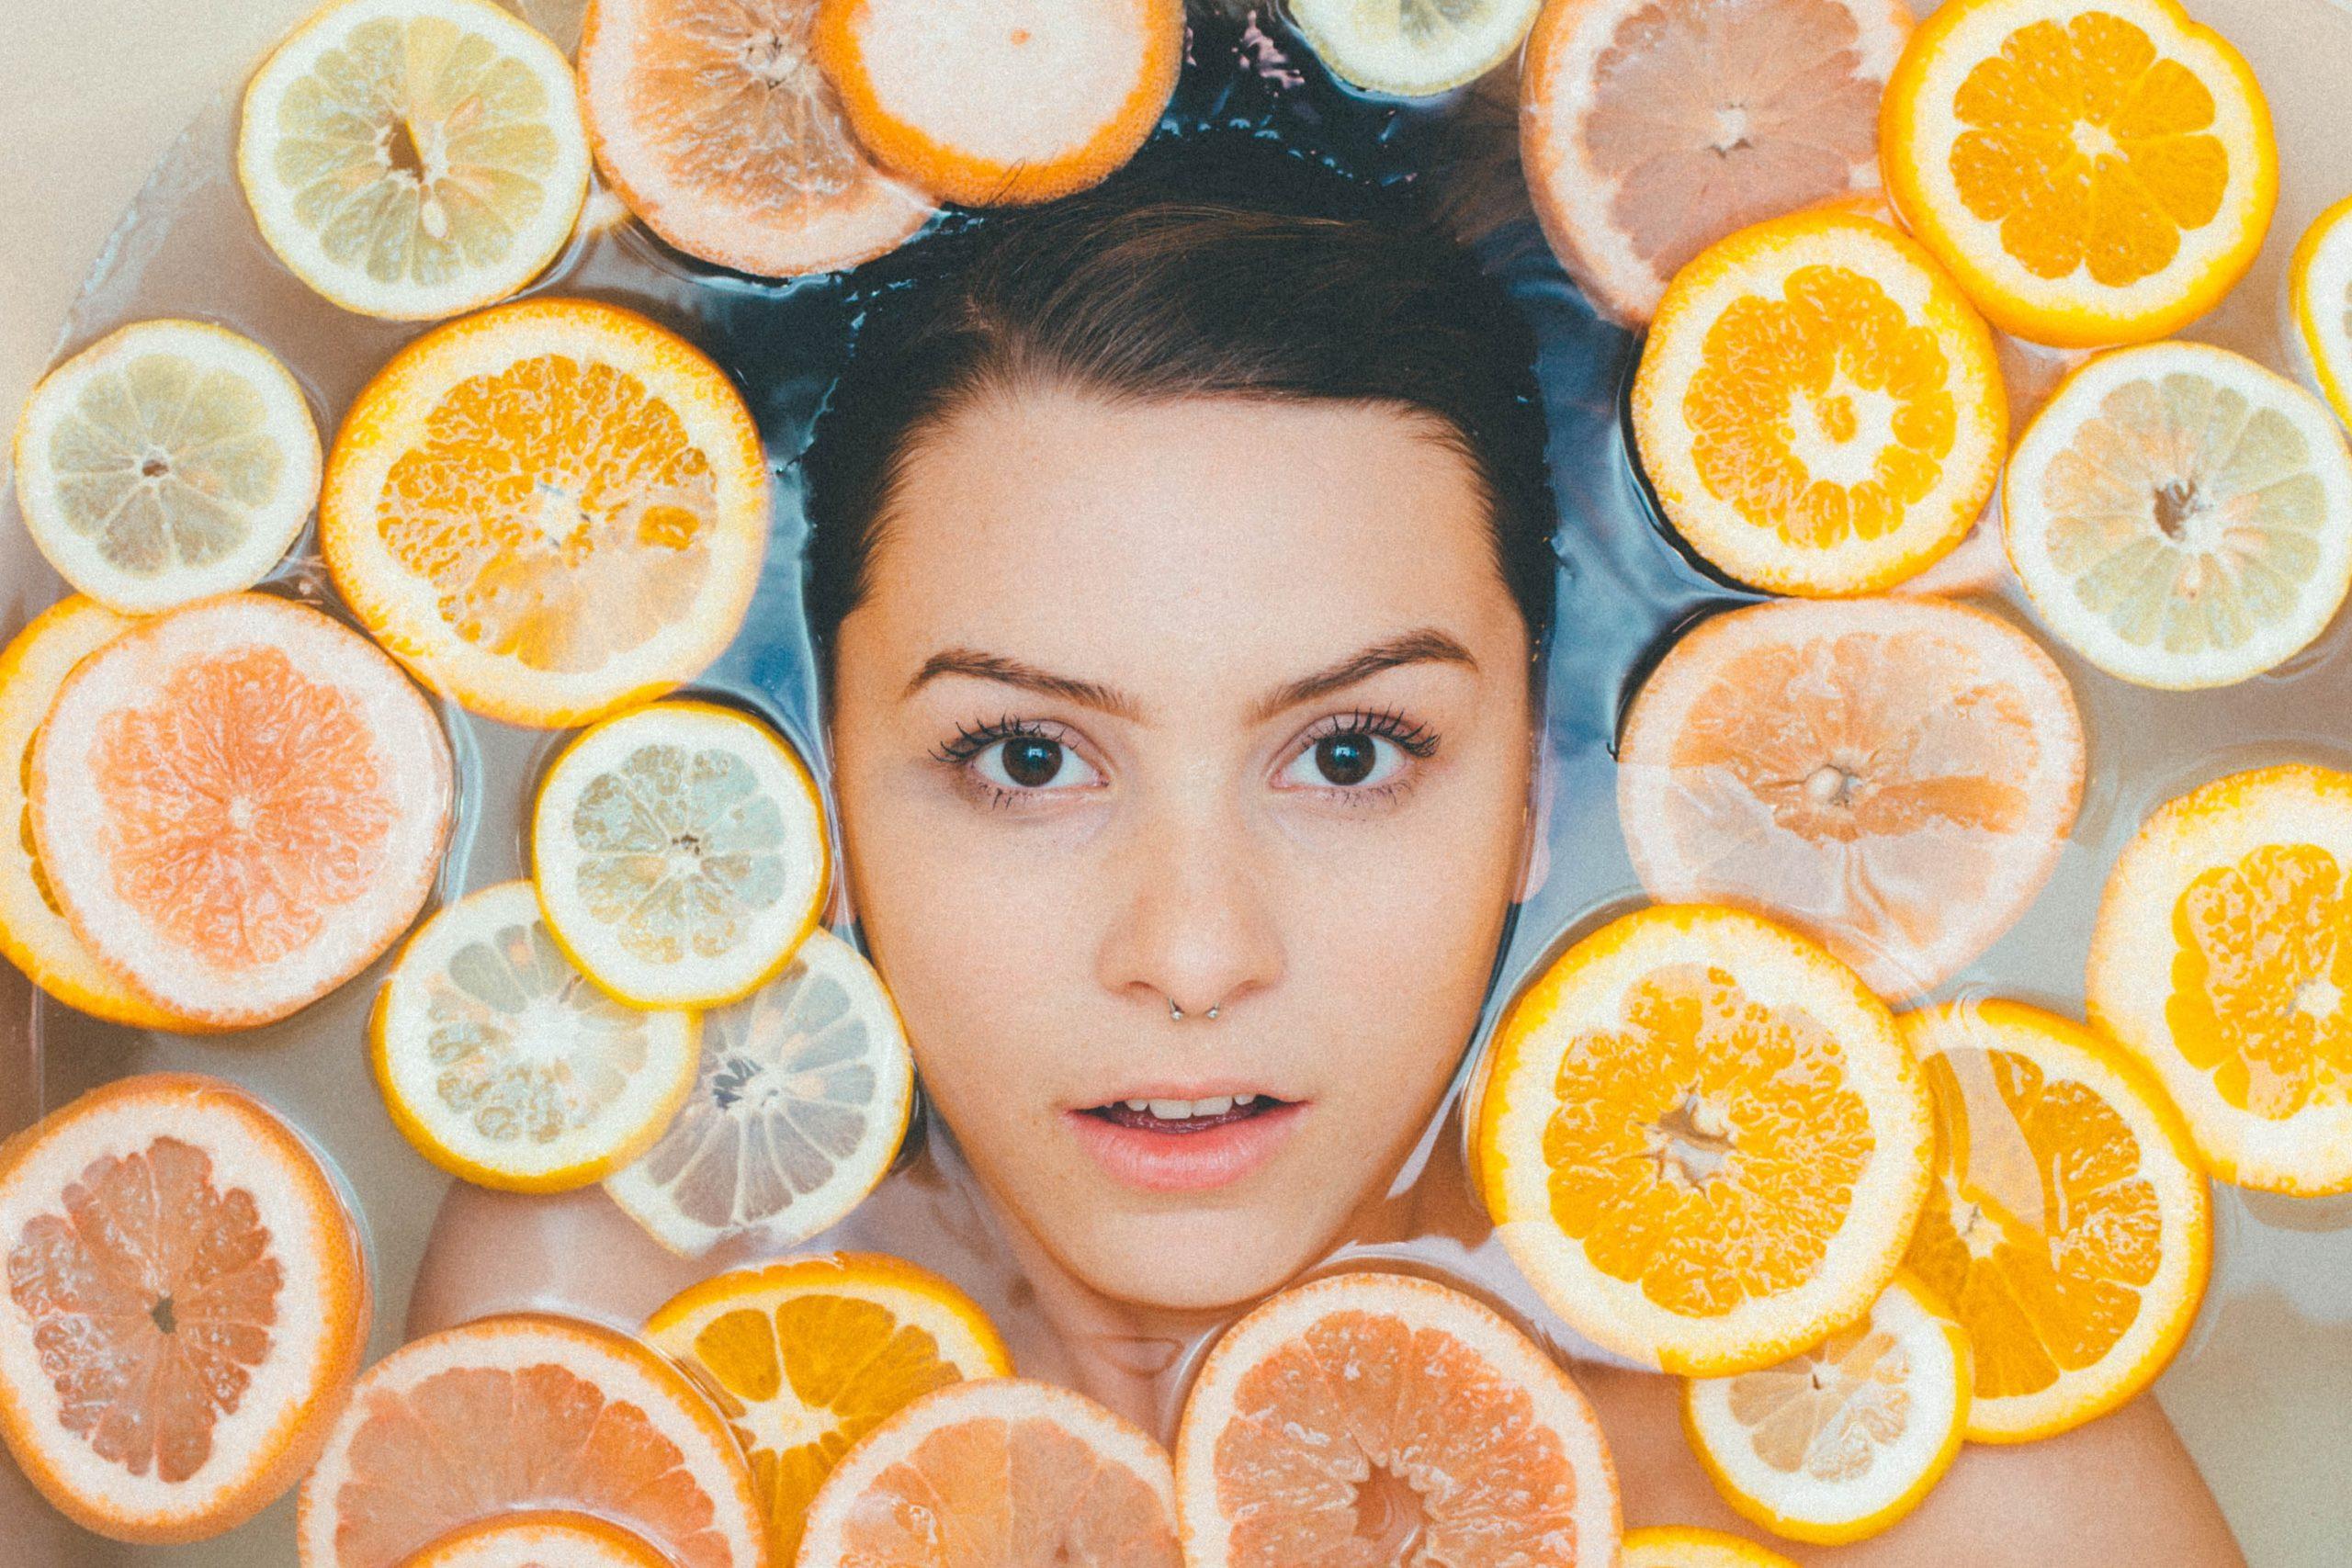 vitamin-c-acid-skin